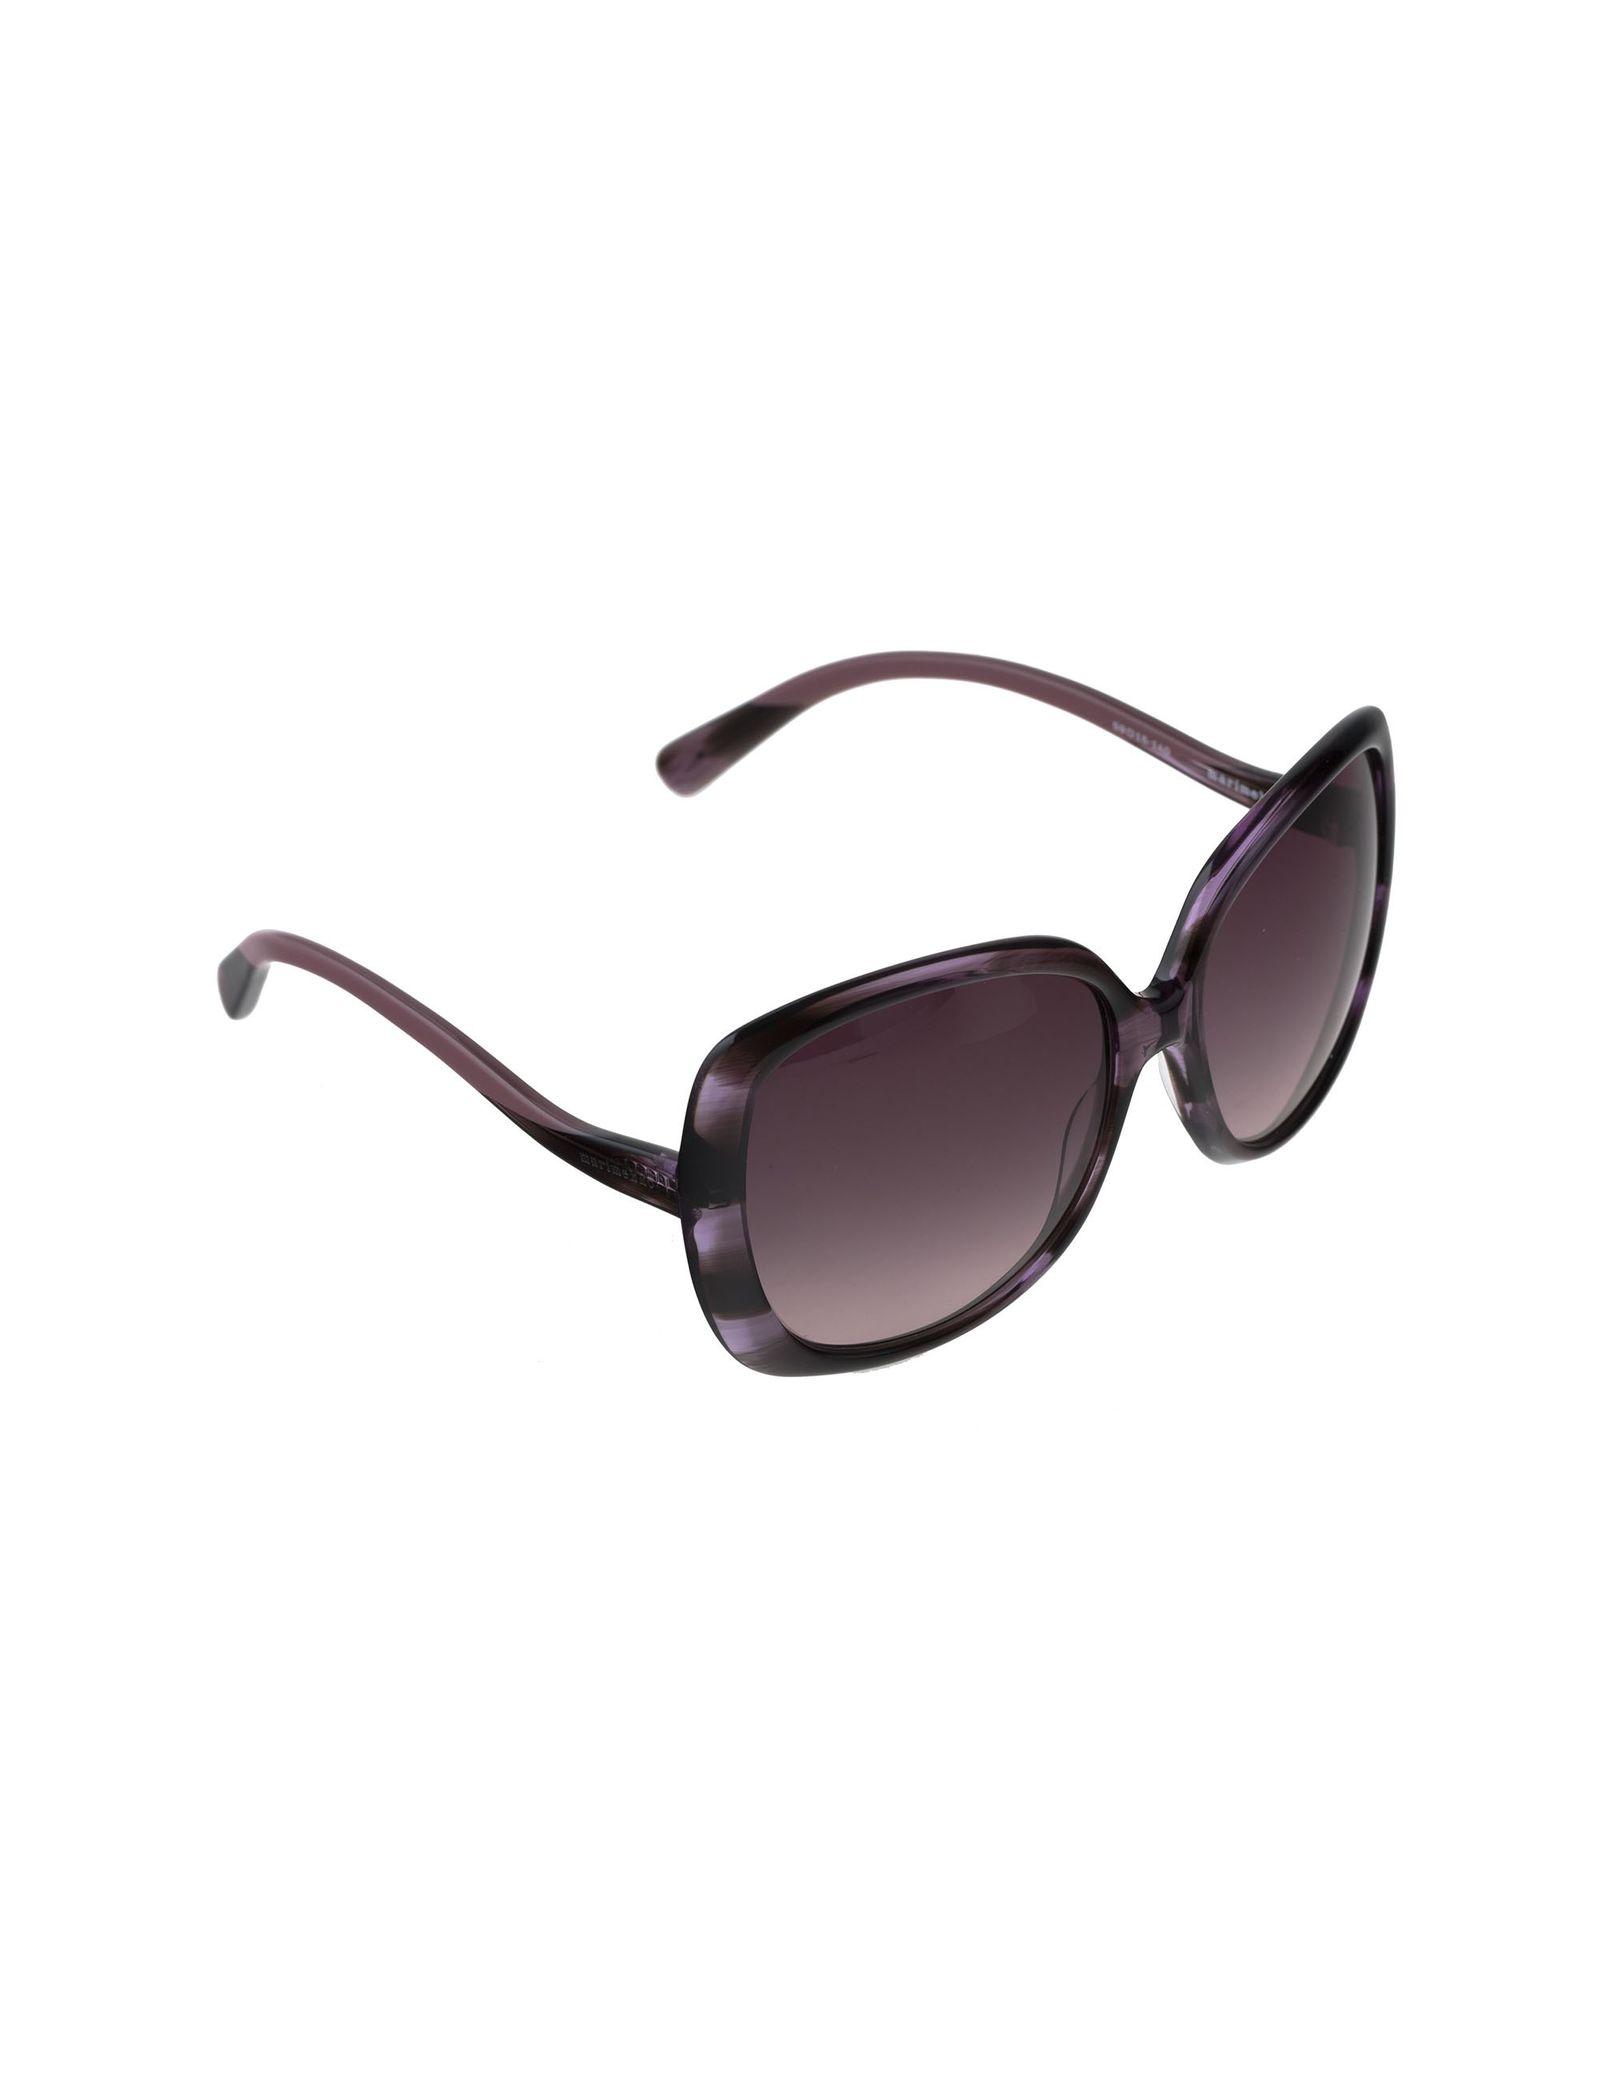 عینک آفتابی مربعی زنانه - ماریم اکو - بنفش   - 2